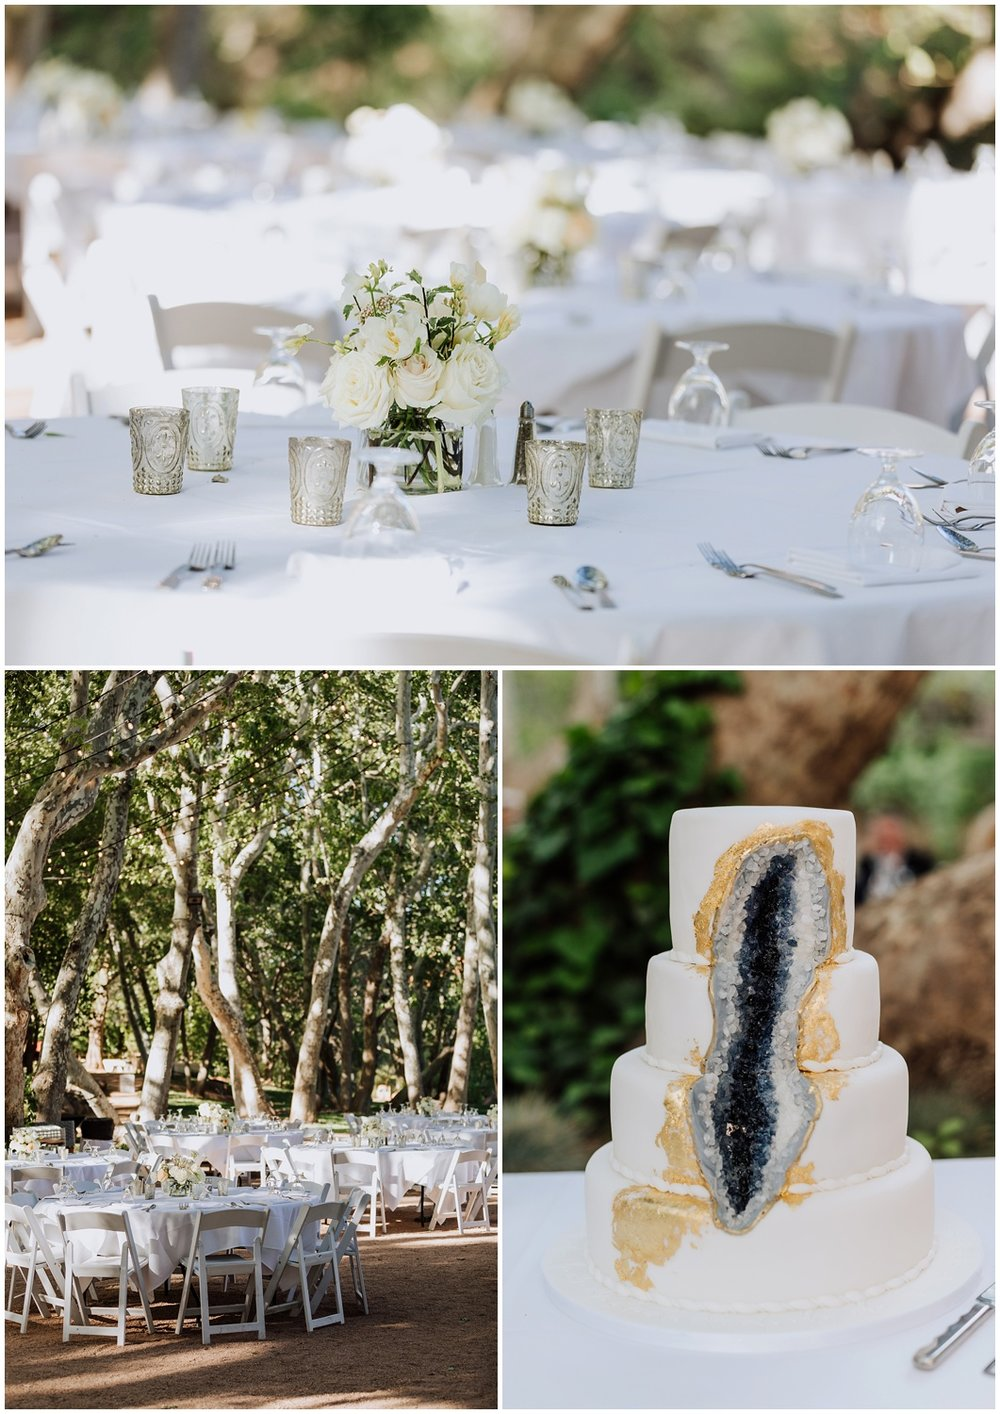 Outdoor Wedding Reception at Oak Creek Canyon in Sedona, Arizona